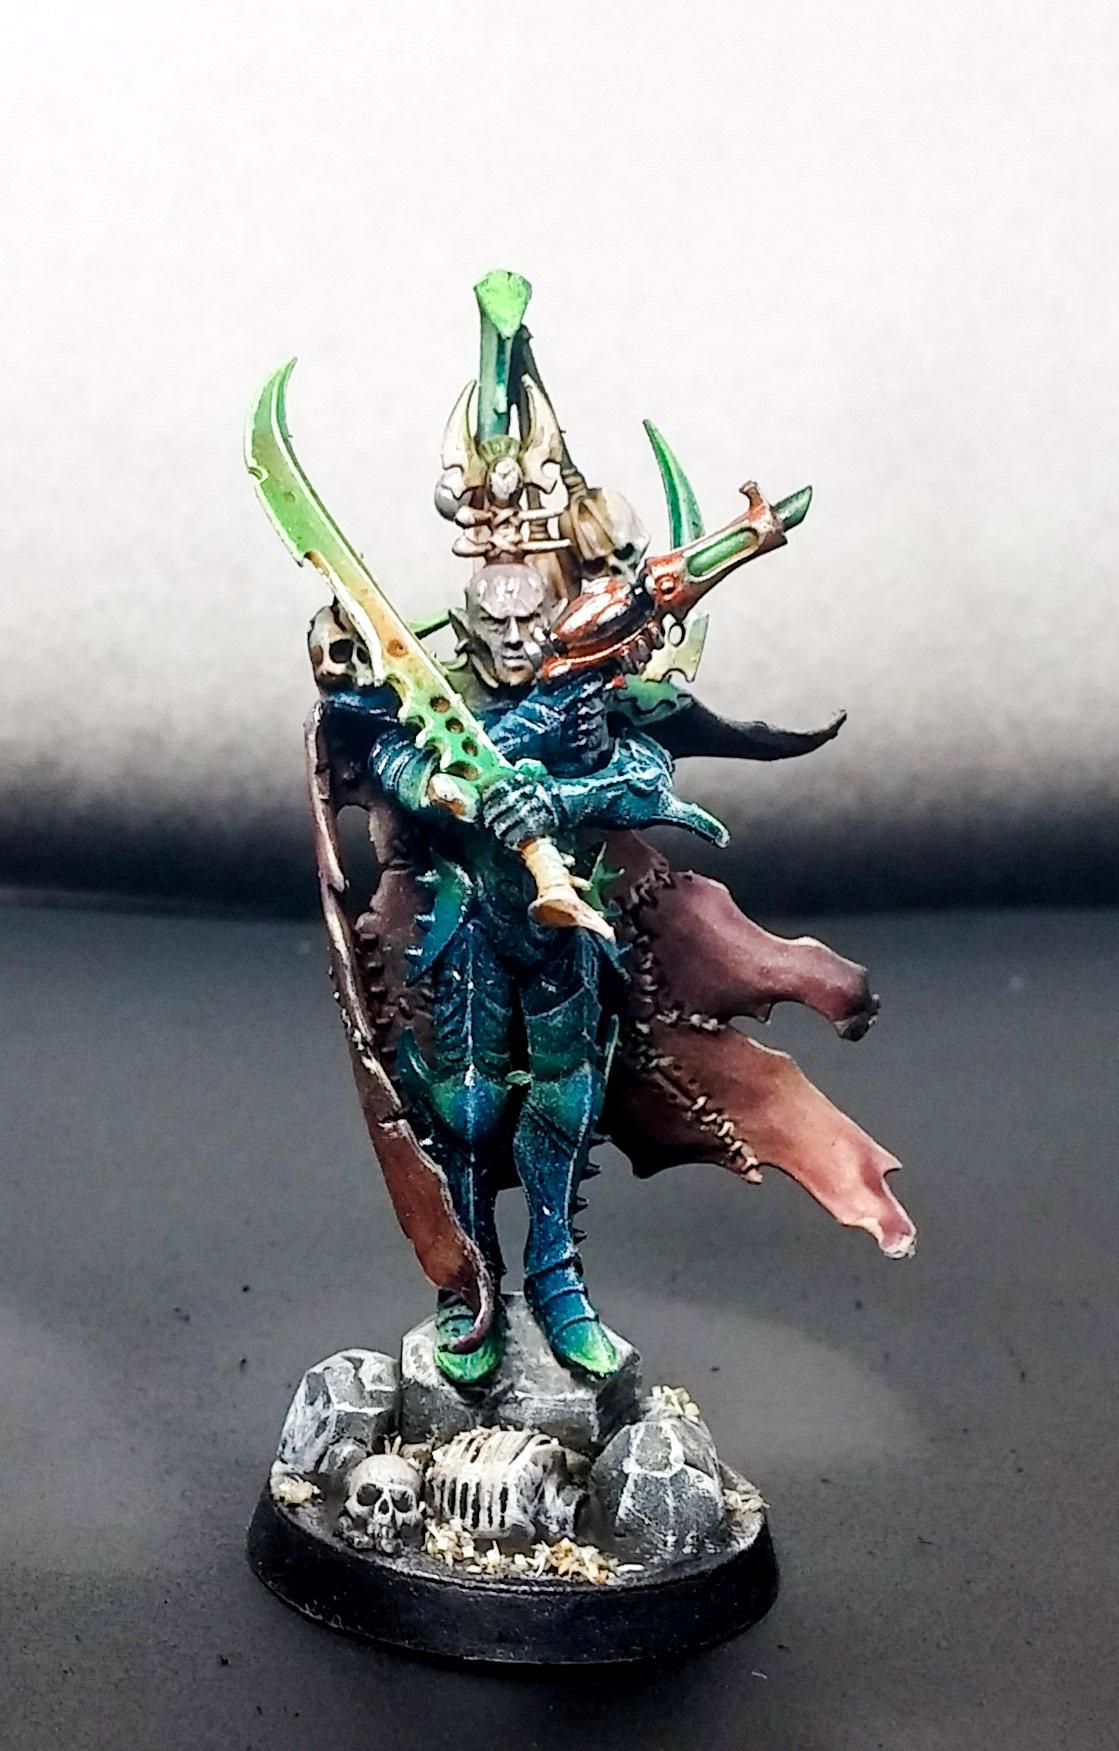 Archon, Bone, Character, Commission, Dark, Dark Eldar, Eldar, Green, Headquarters, Skin